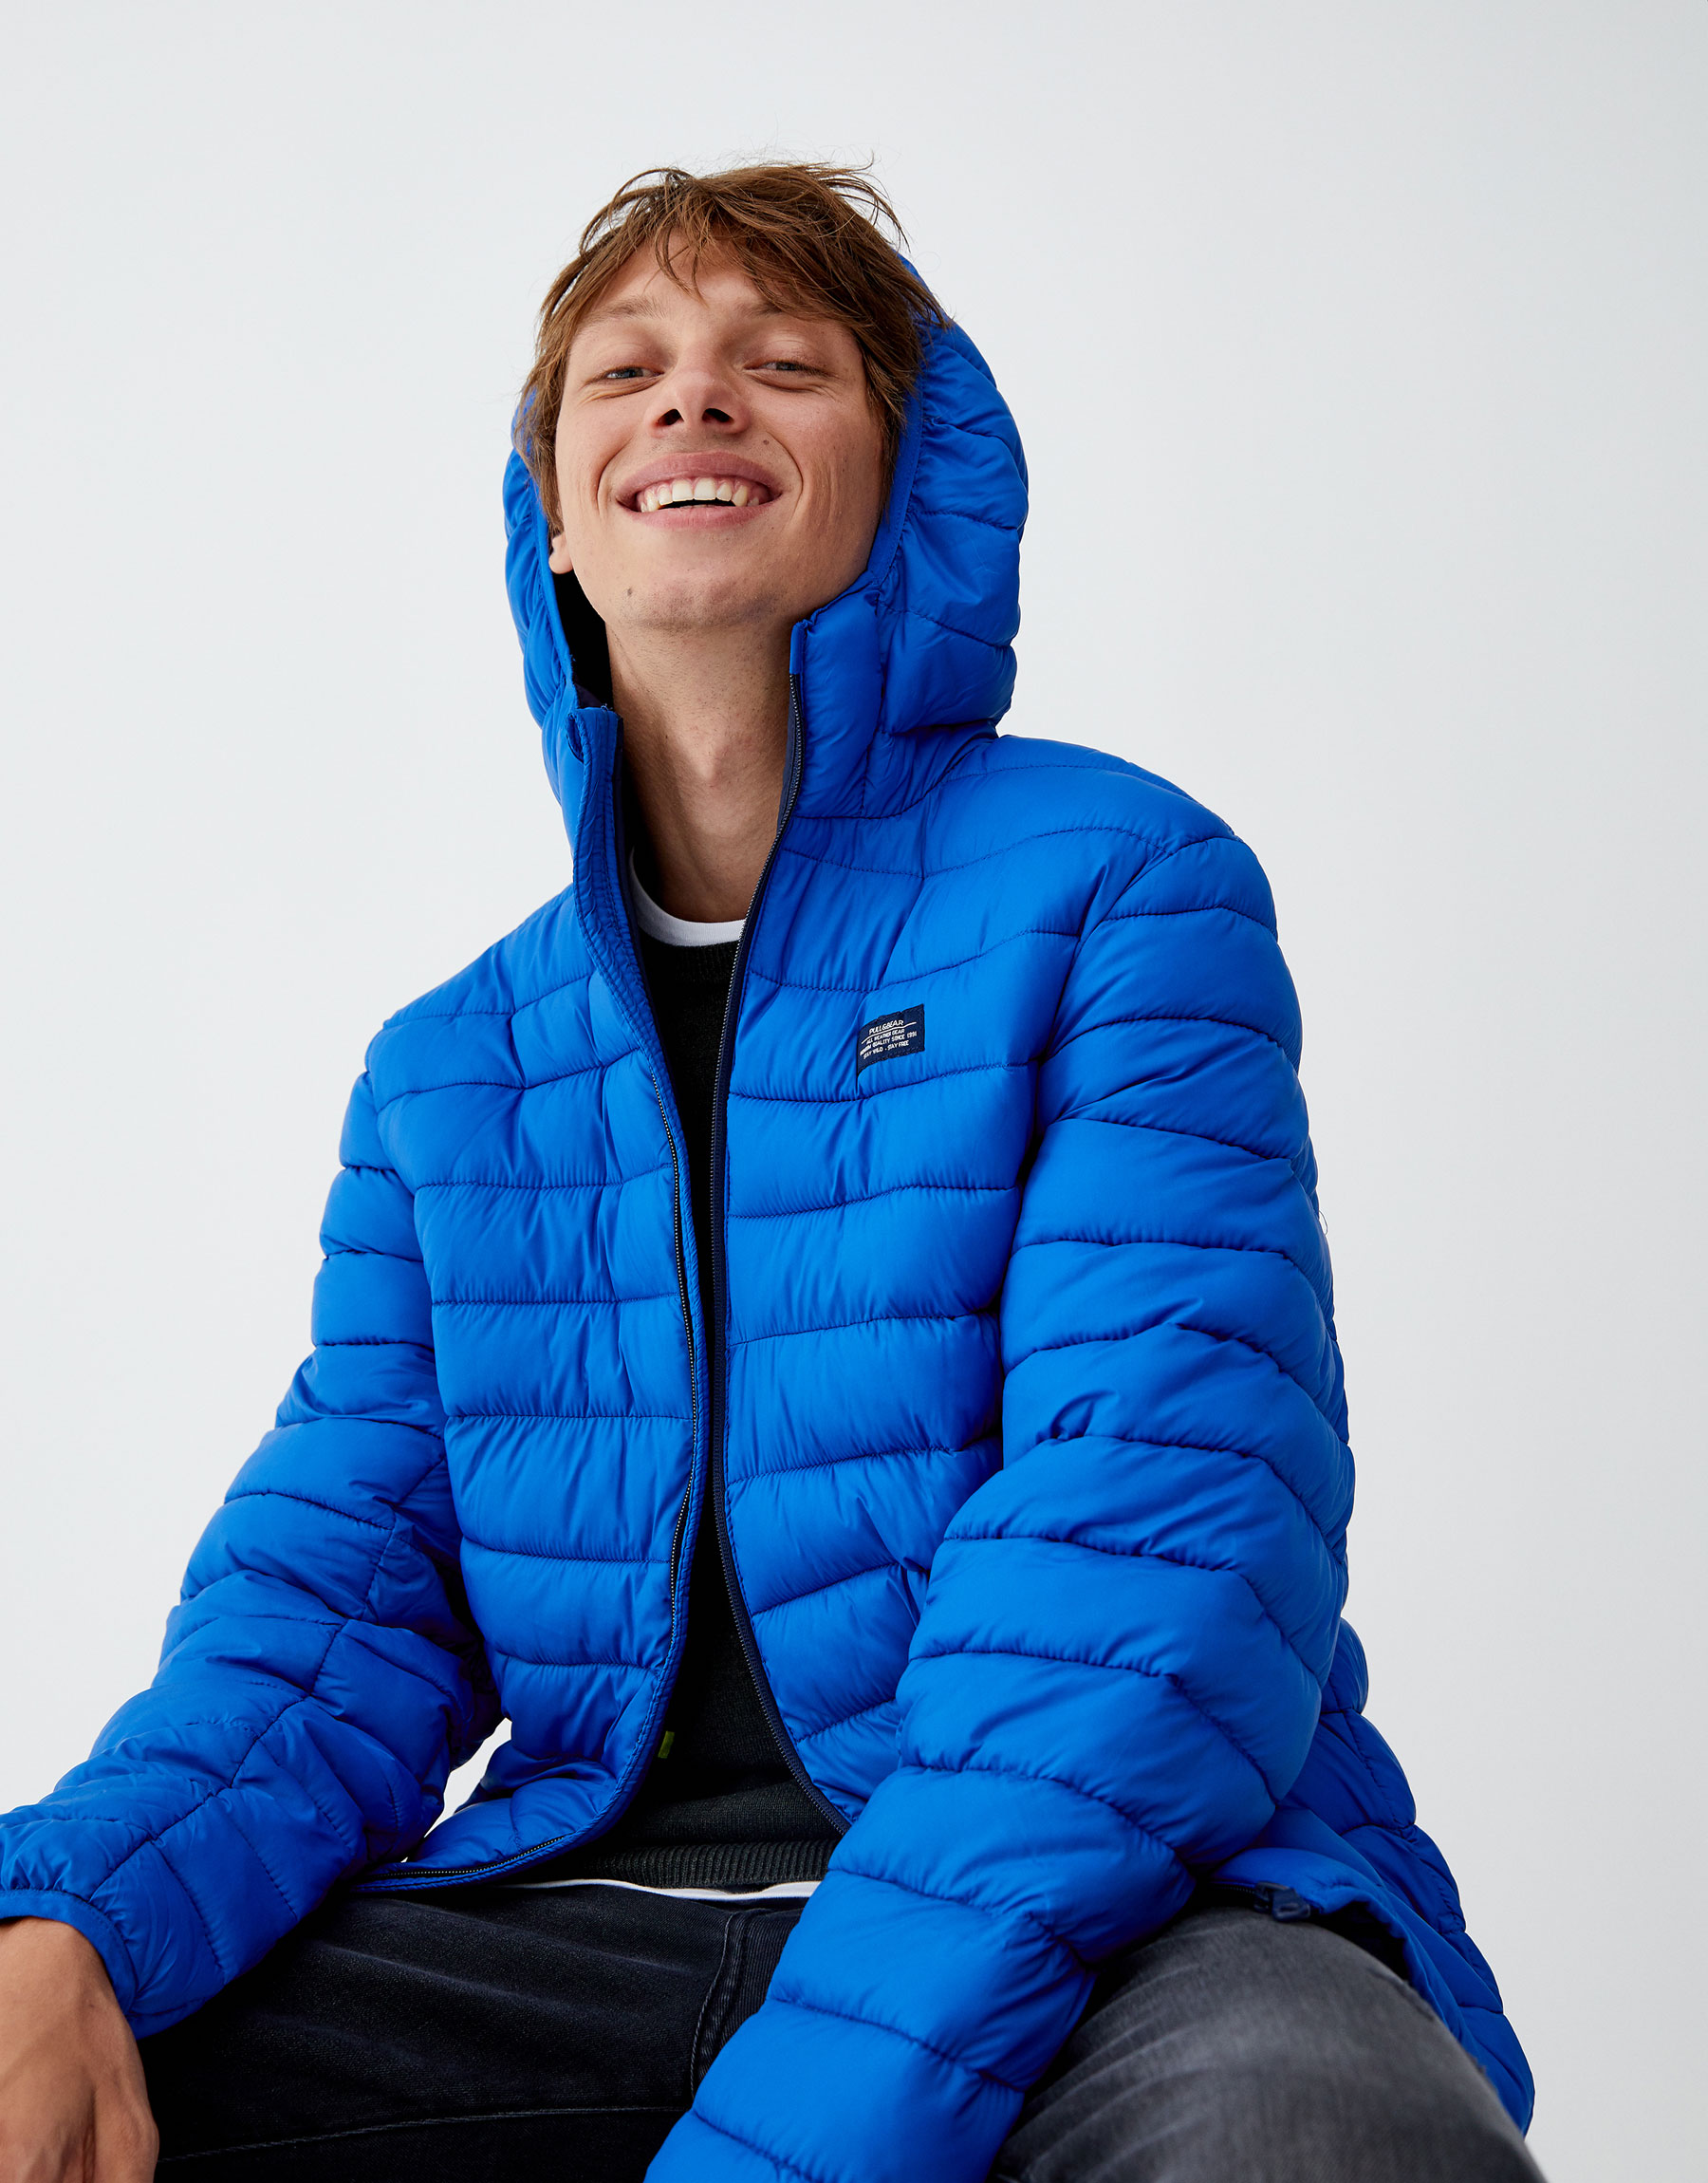 a3313223c1d4d Pull & Bear Lightweight puffer jacket with hood at £29.99 | love the ...